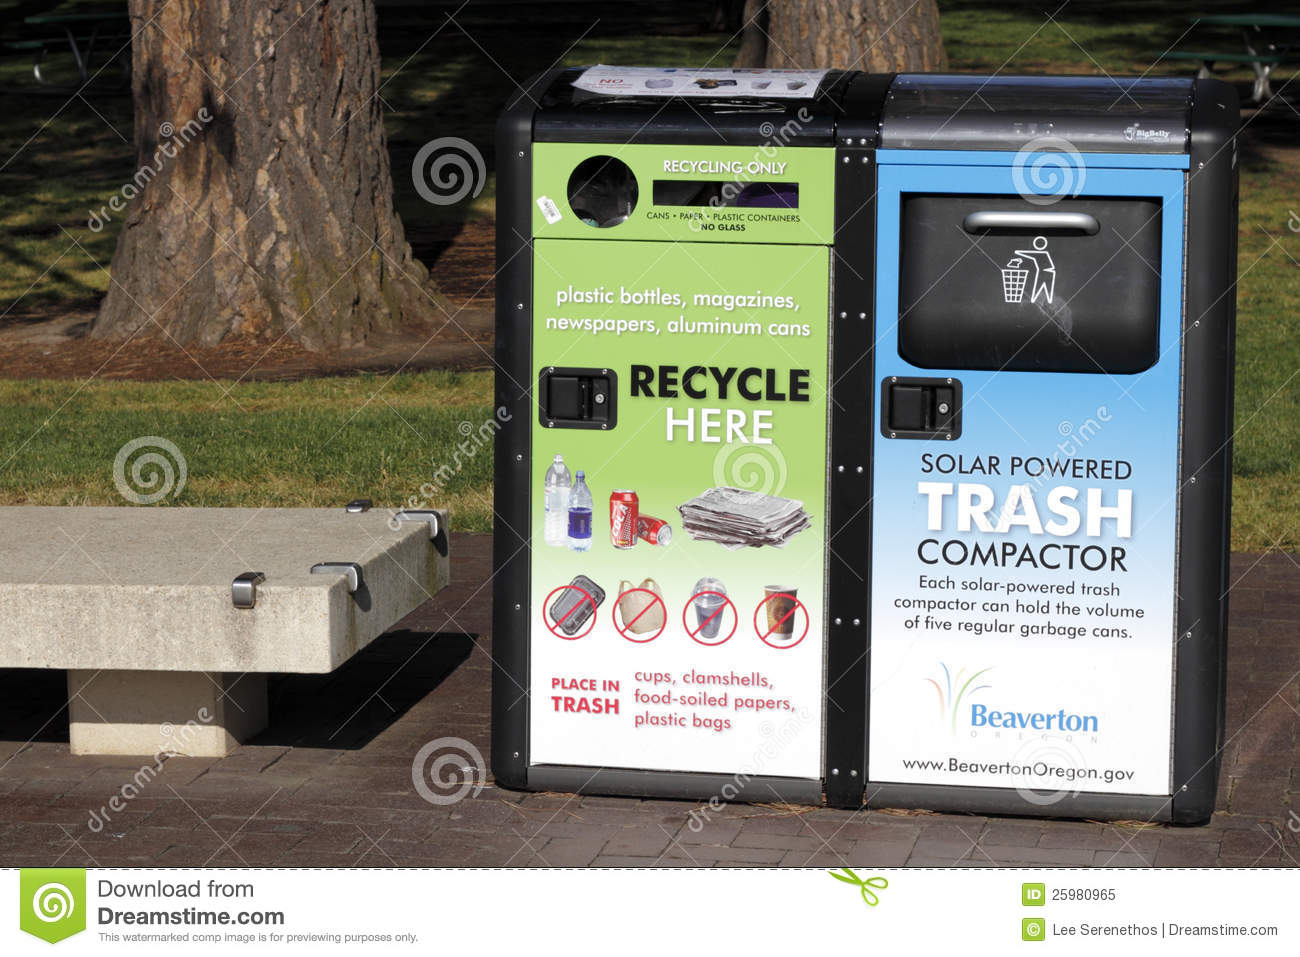 http://thumbs.dreamstime.com/z/solar-powered-trash-compactor-25980965.jpg